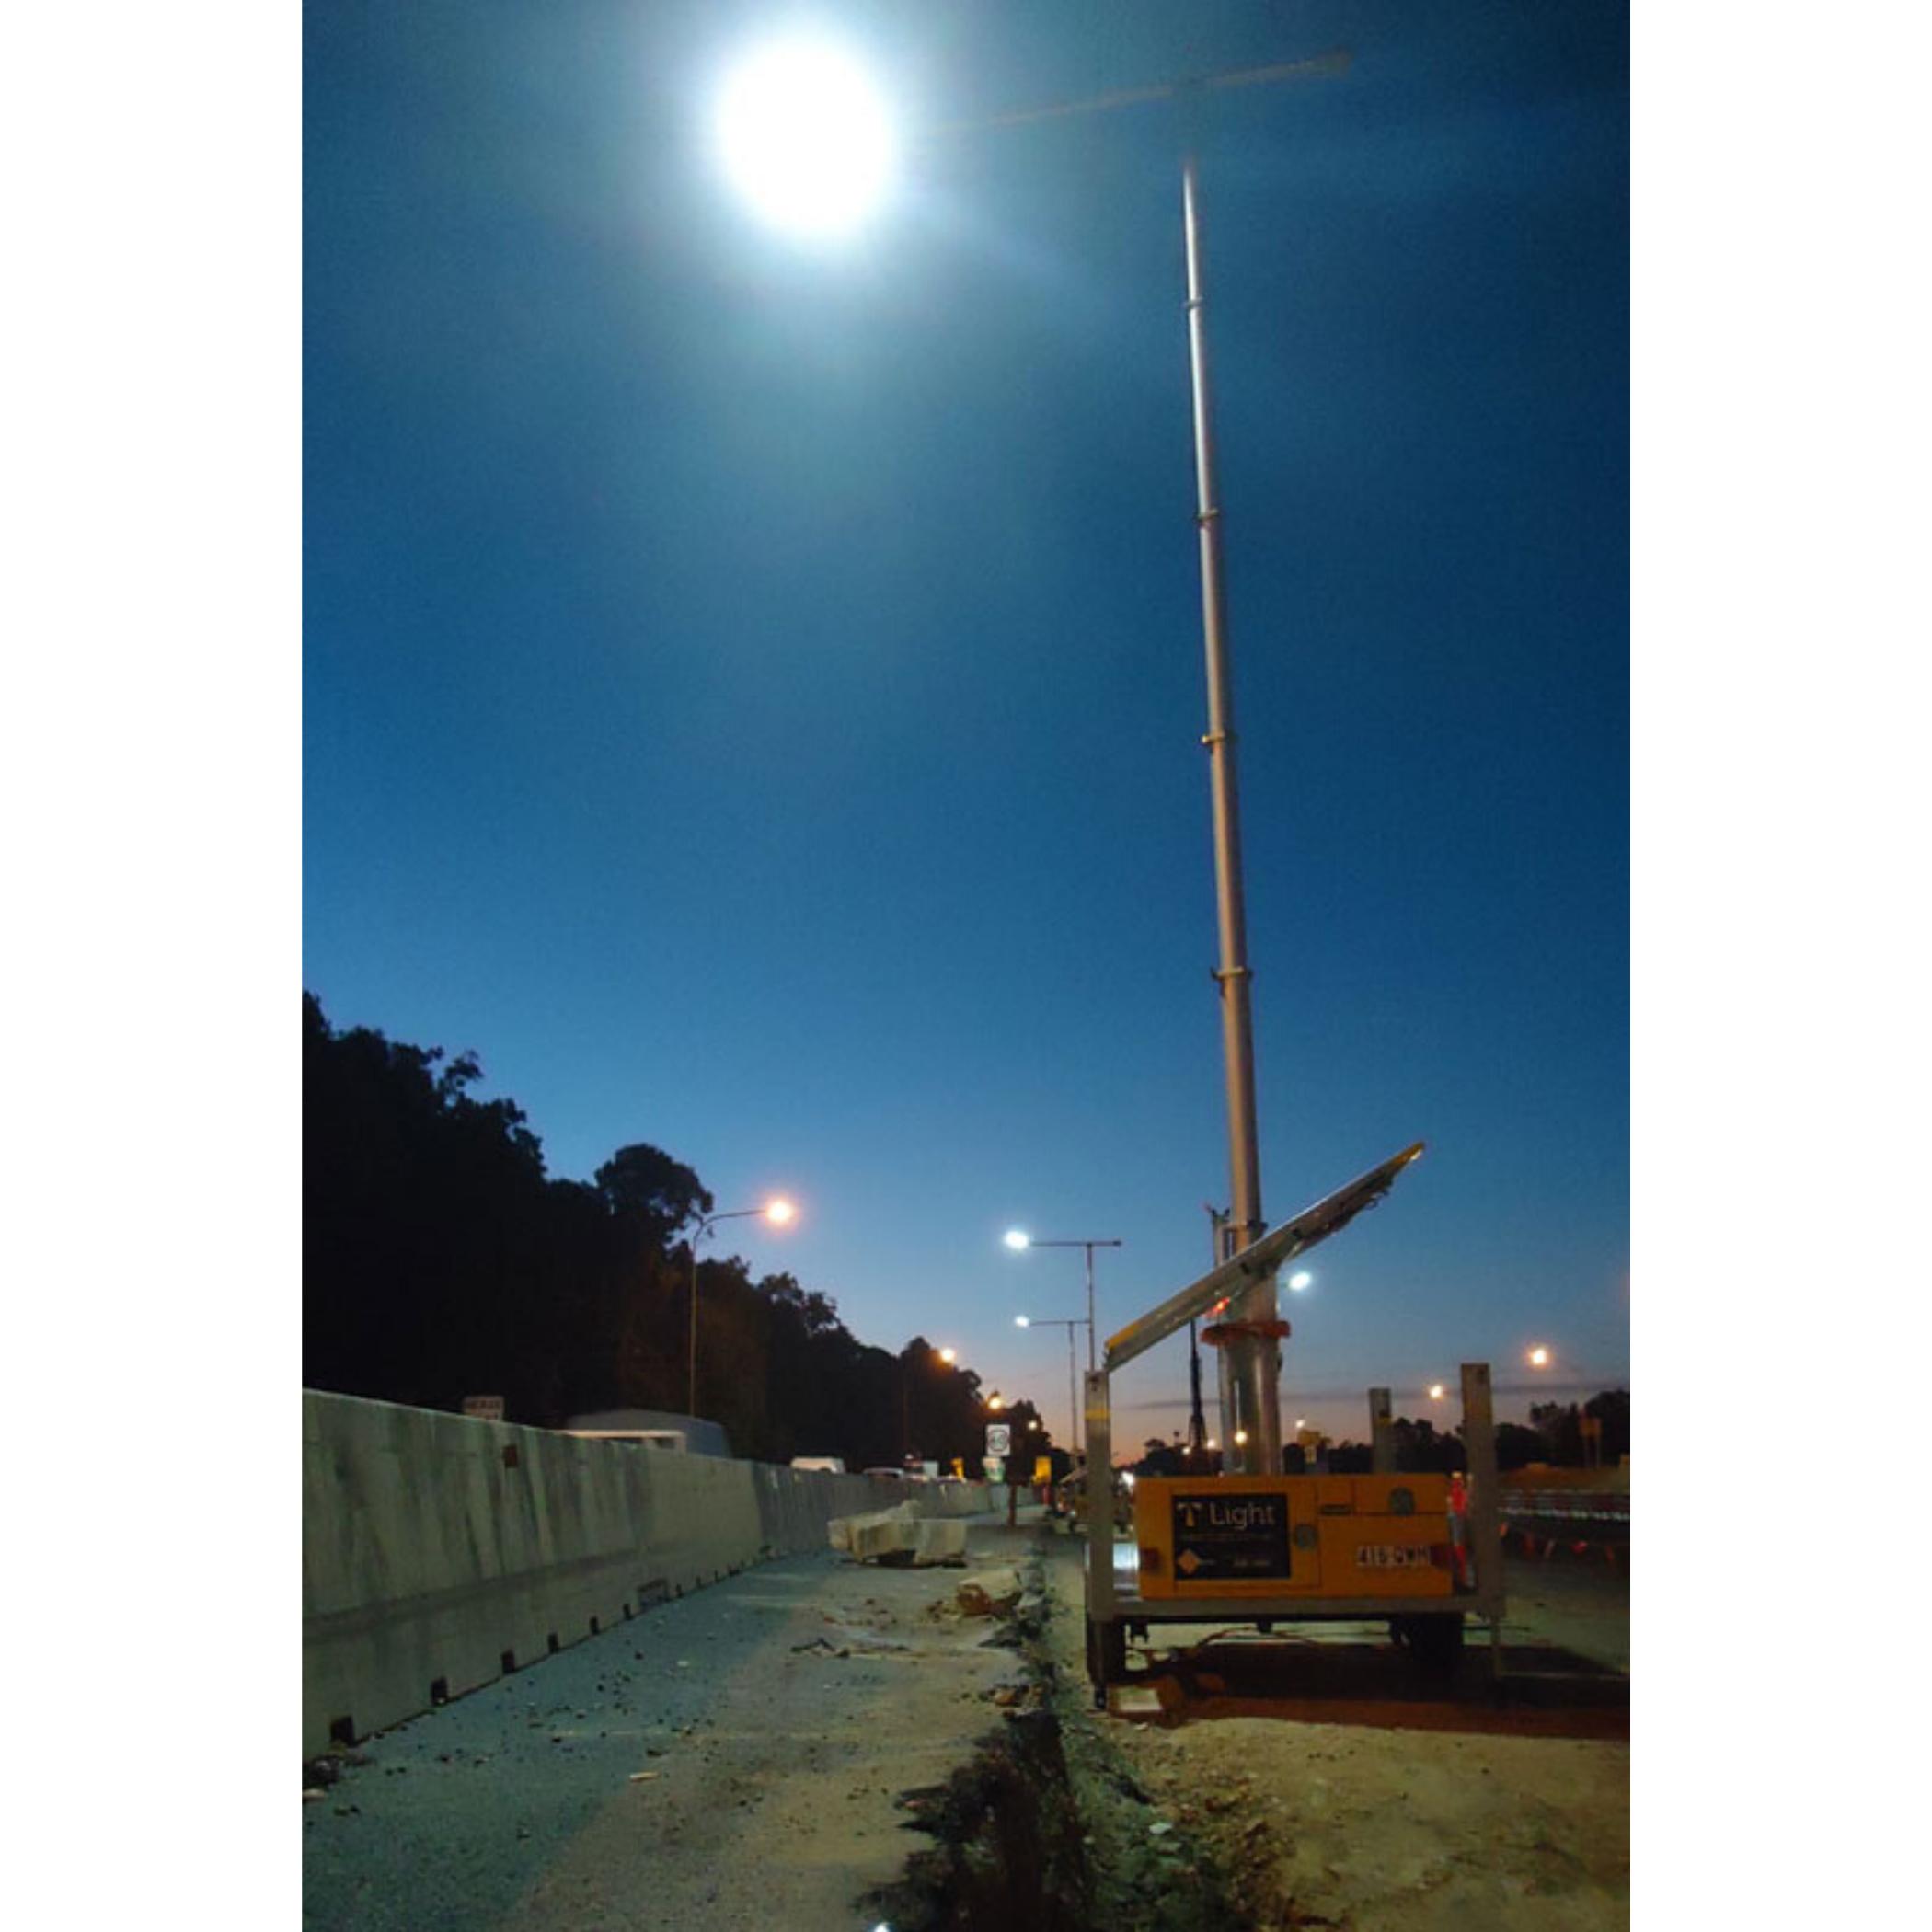 T- Light set up at a construction site